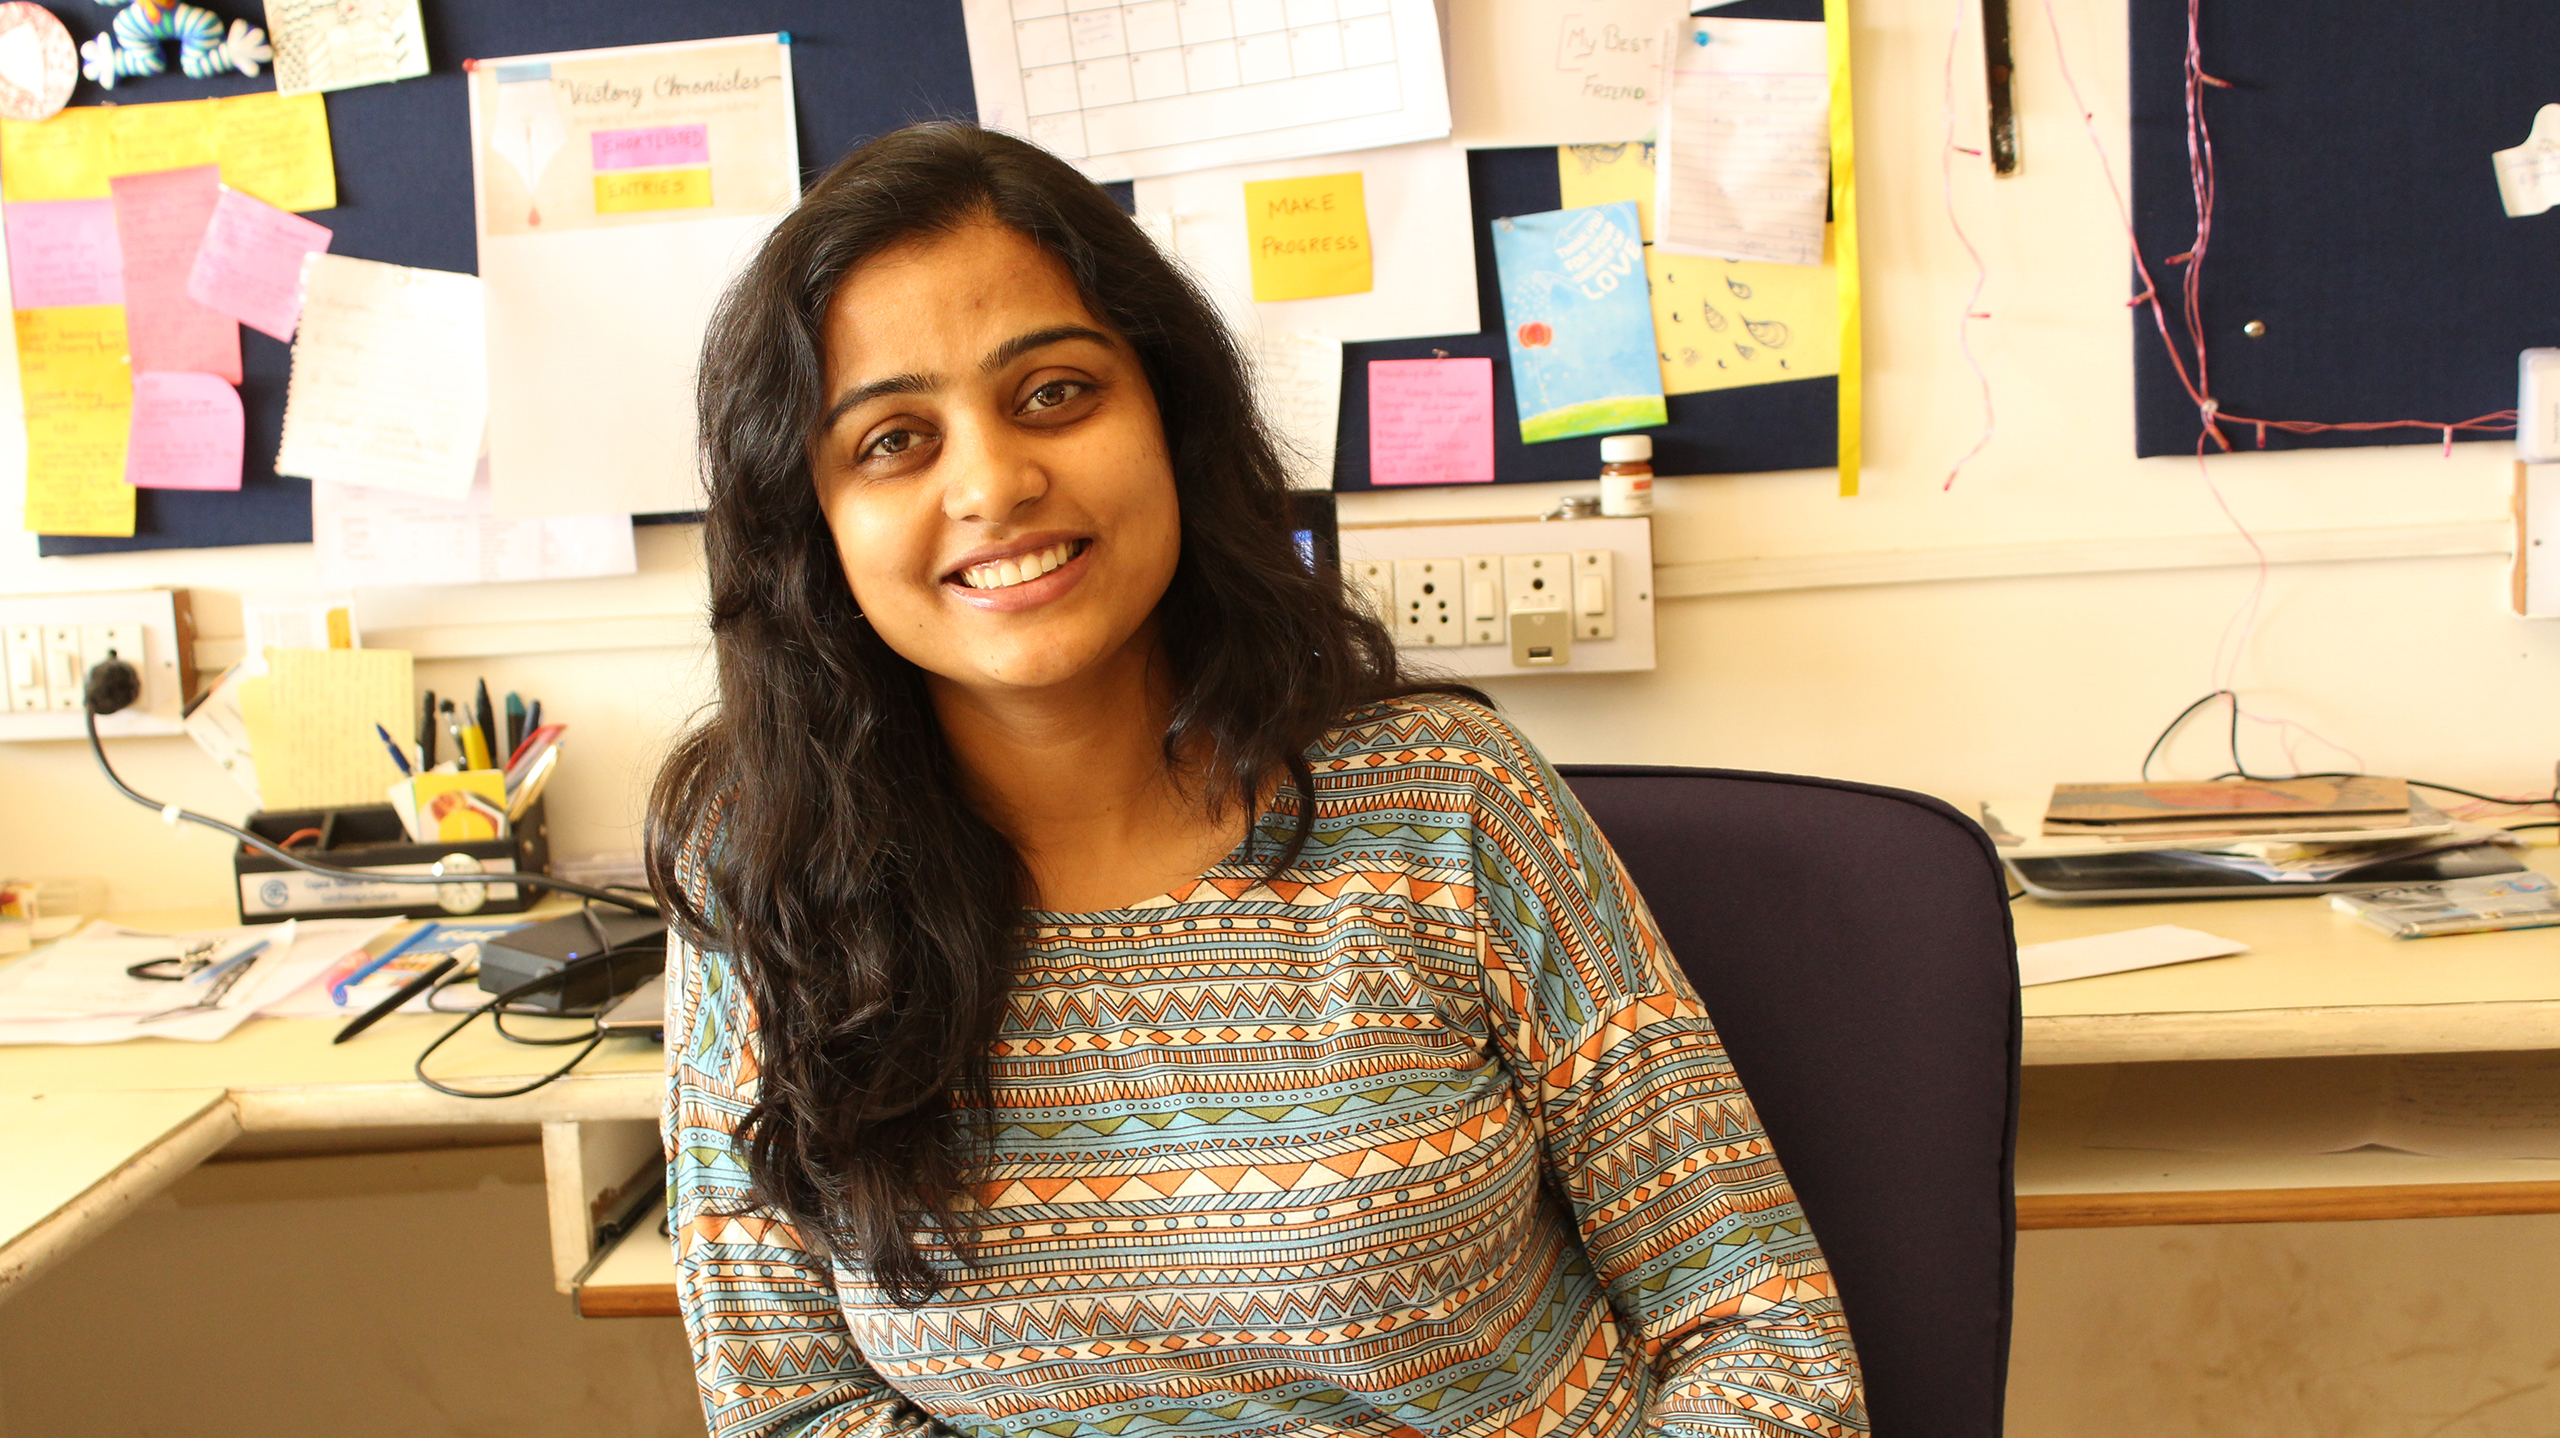 Aditi Gupta, founder of Menstrupedia, poses for a portrait.  The organization's offices are based in Gujarat, India